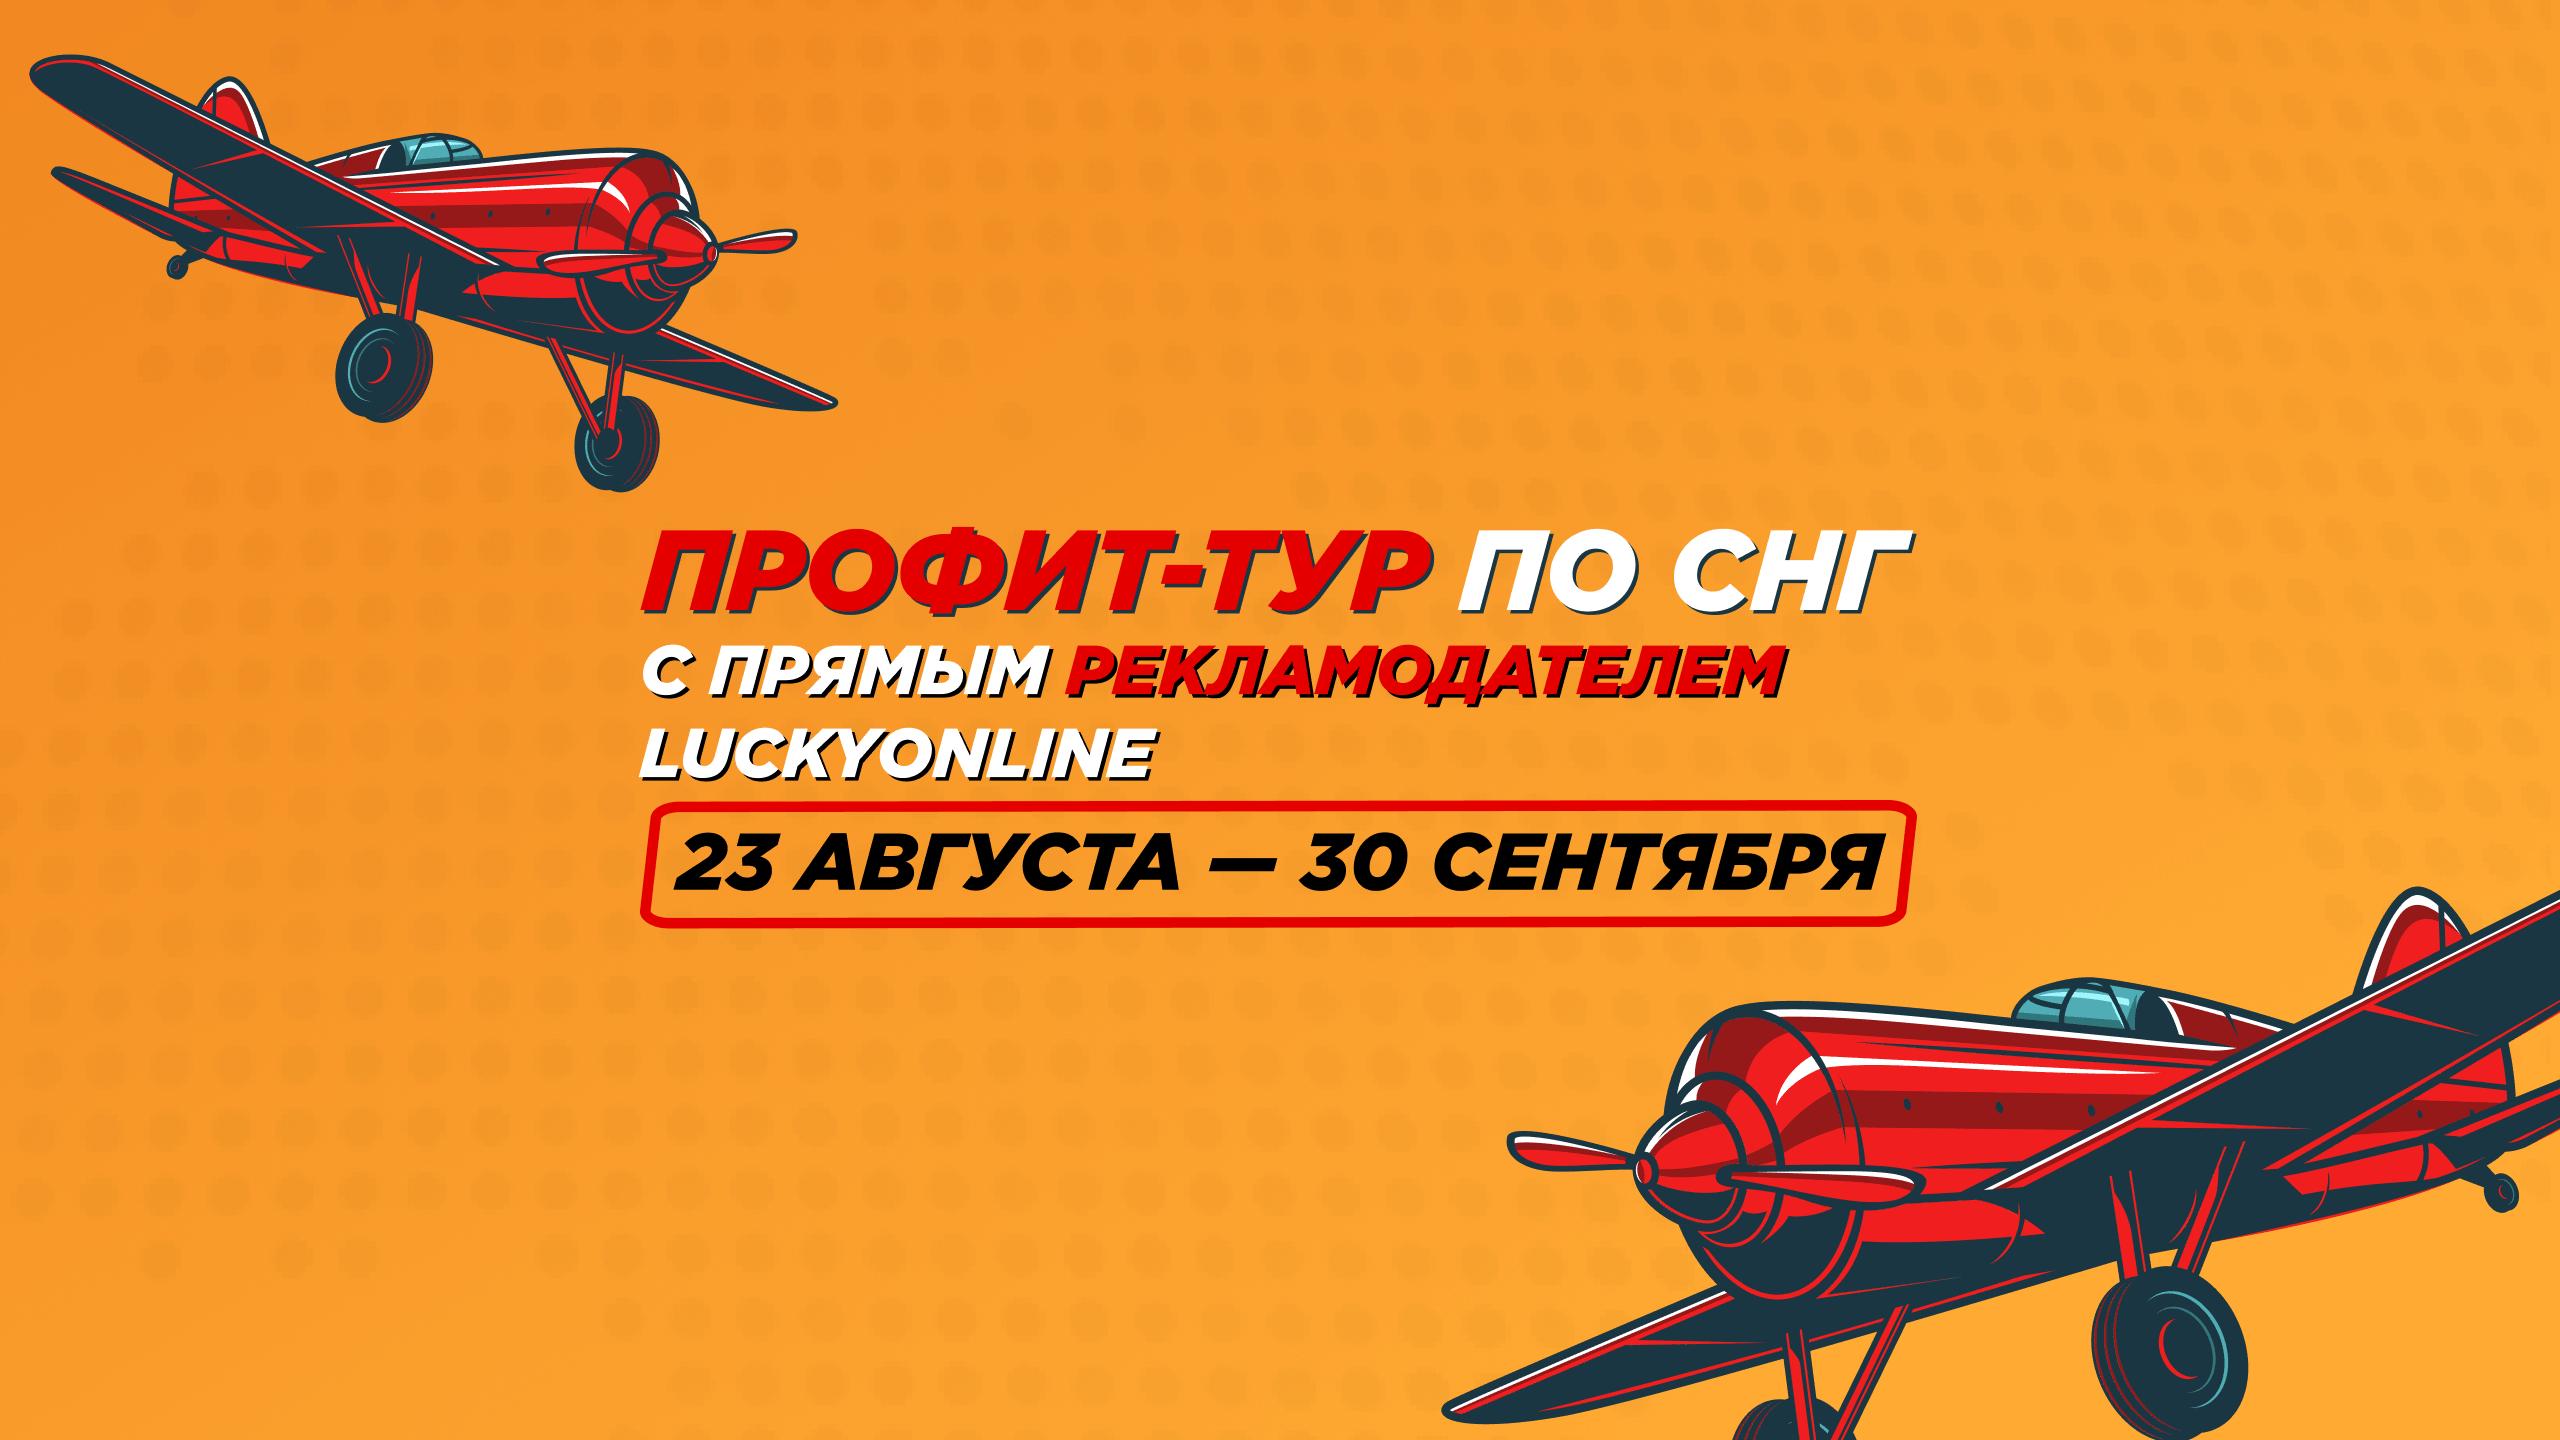 Полетели в ПРОФИТ-ТУР по СНГ🚀